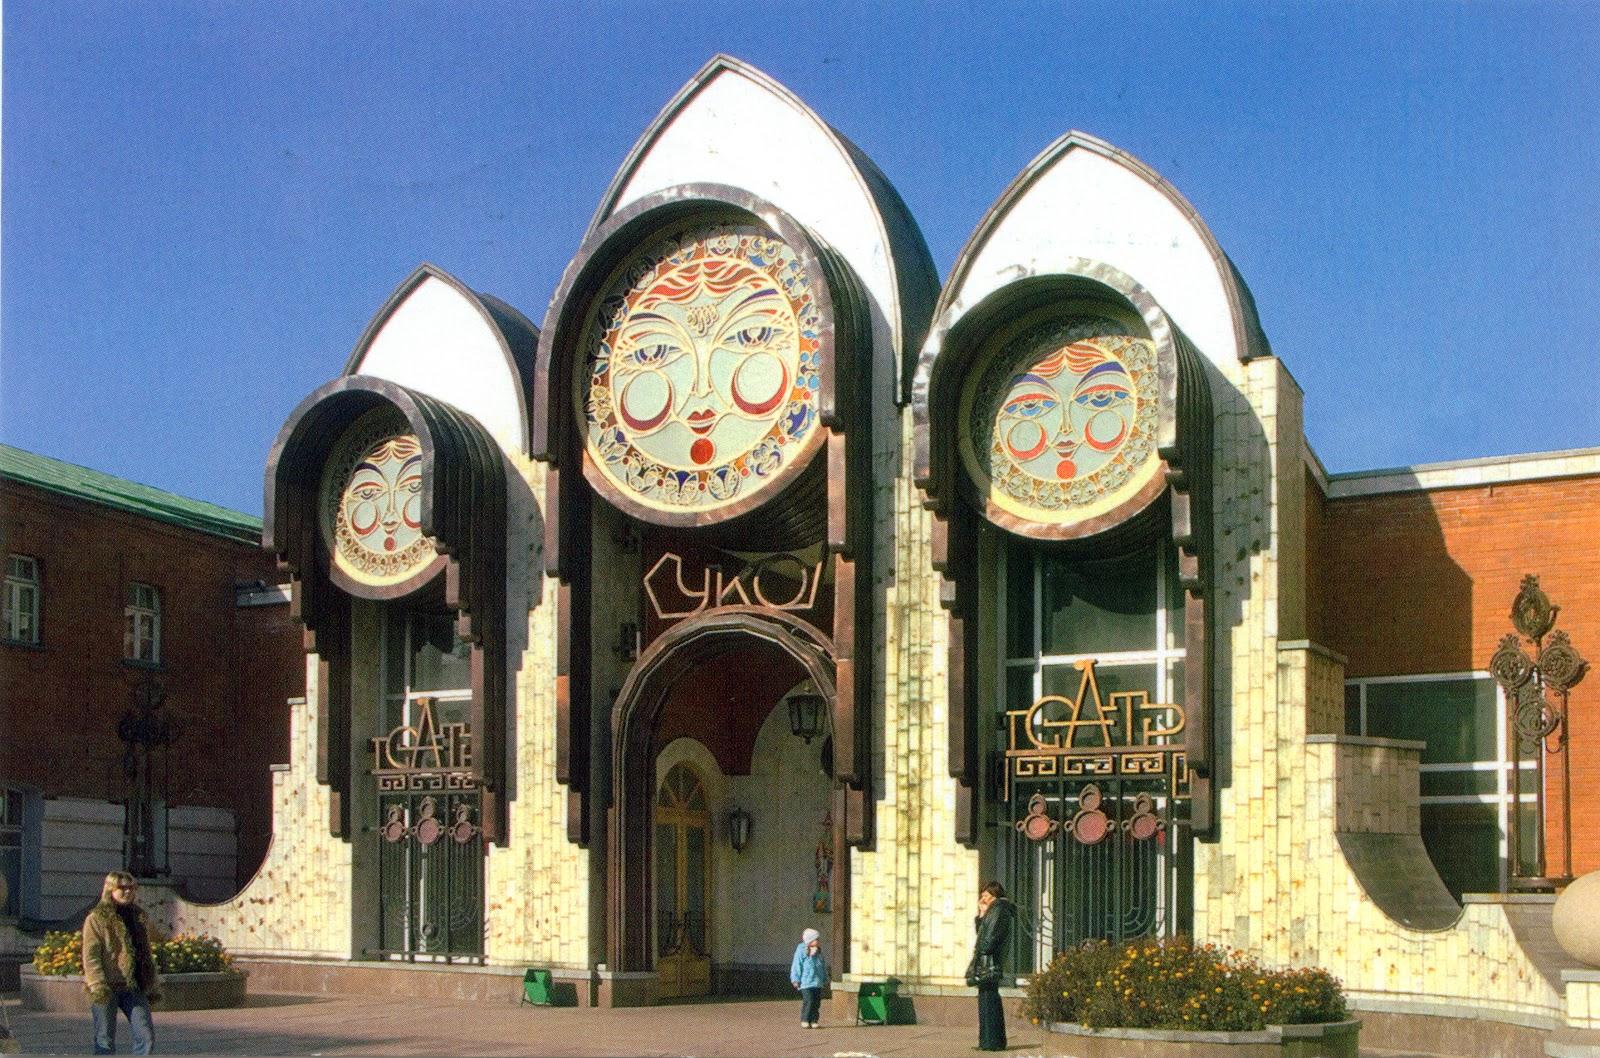 Novosibirsk Russia  City new picture : ... , COME TO MY HOME!: 0187 RUSSIA Novosibirsk Oblast Puppet Theatre